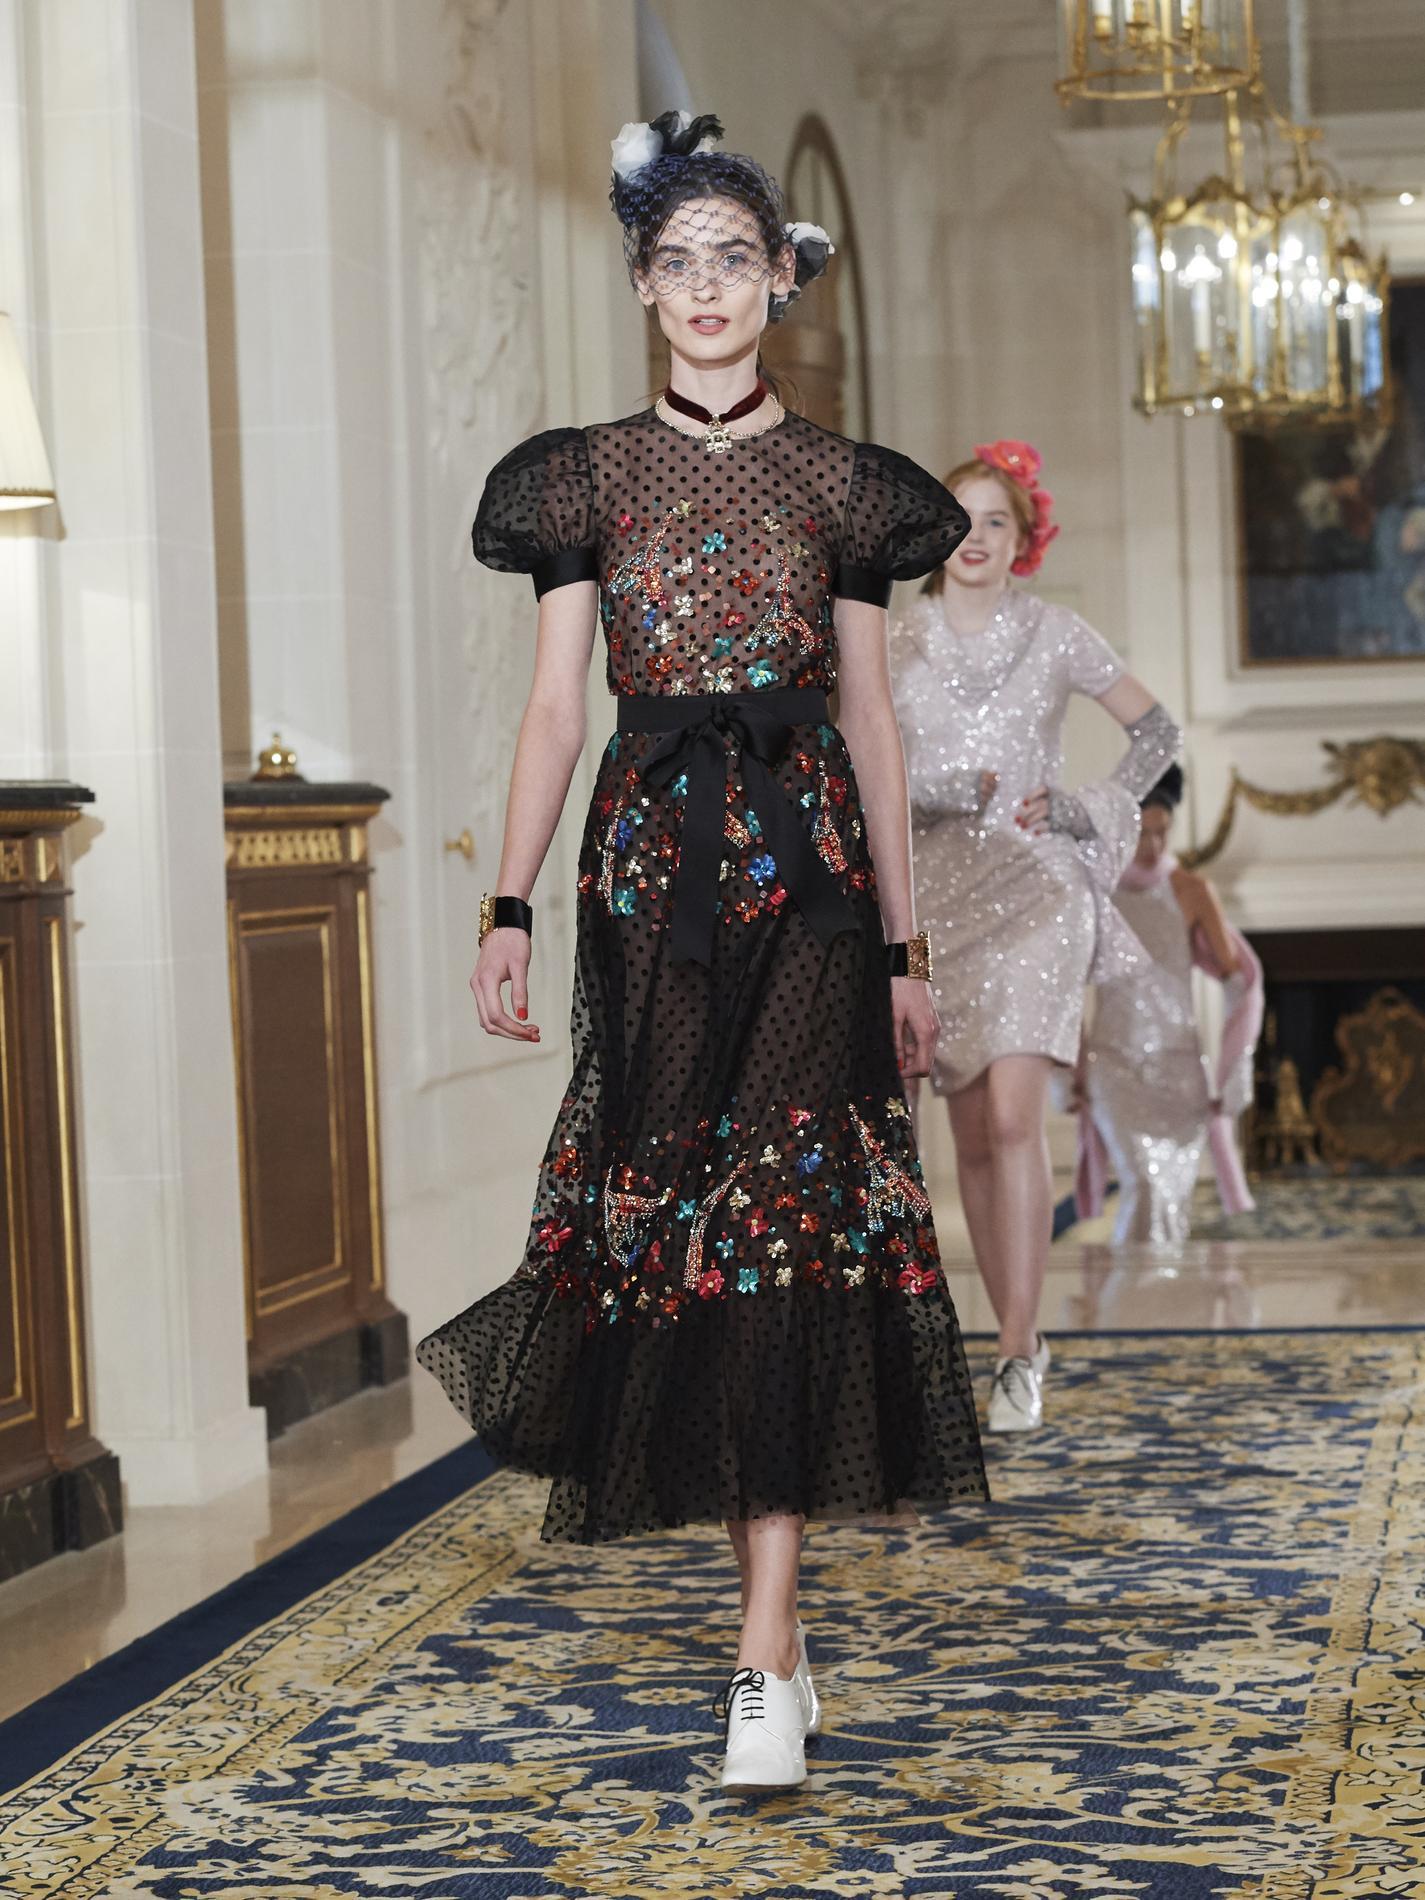 a33b0b6dd9bb Défilé Chanel Métiers d  39 Art   les Coco Girls emballent ...